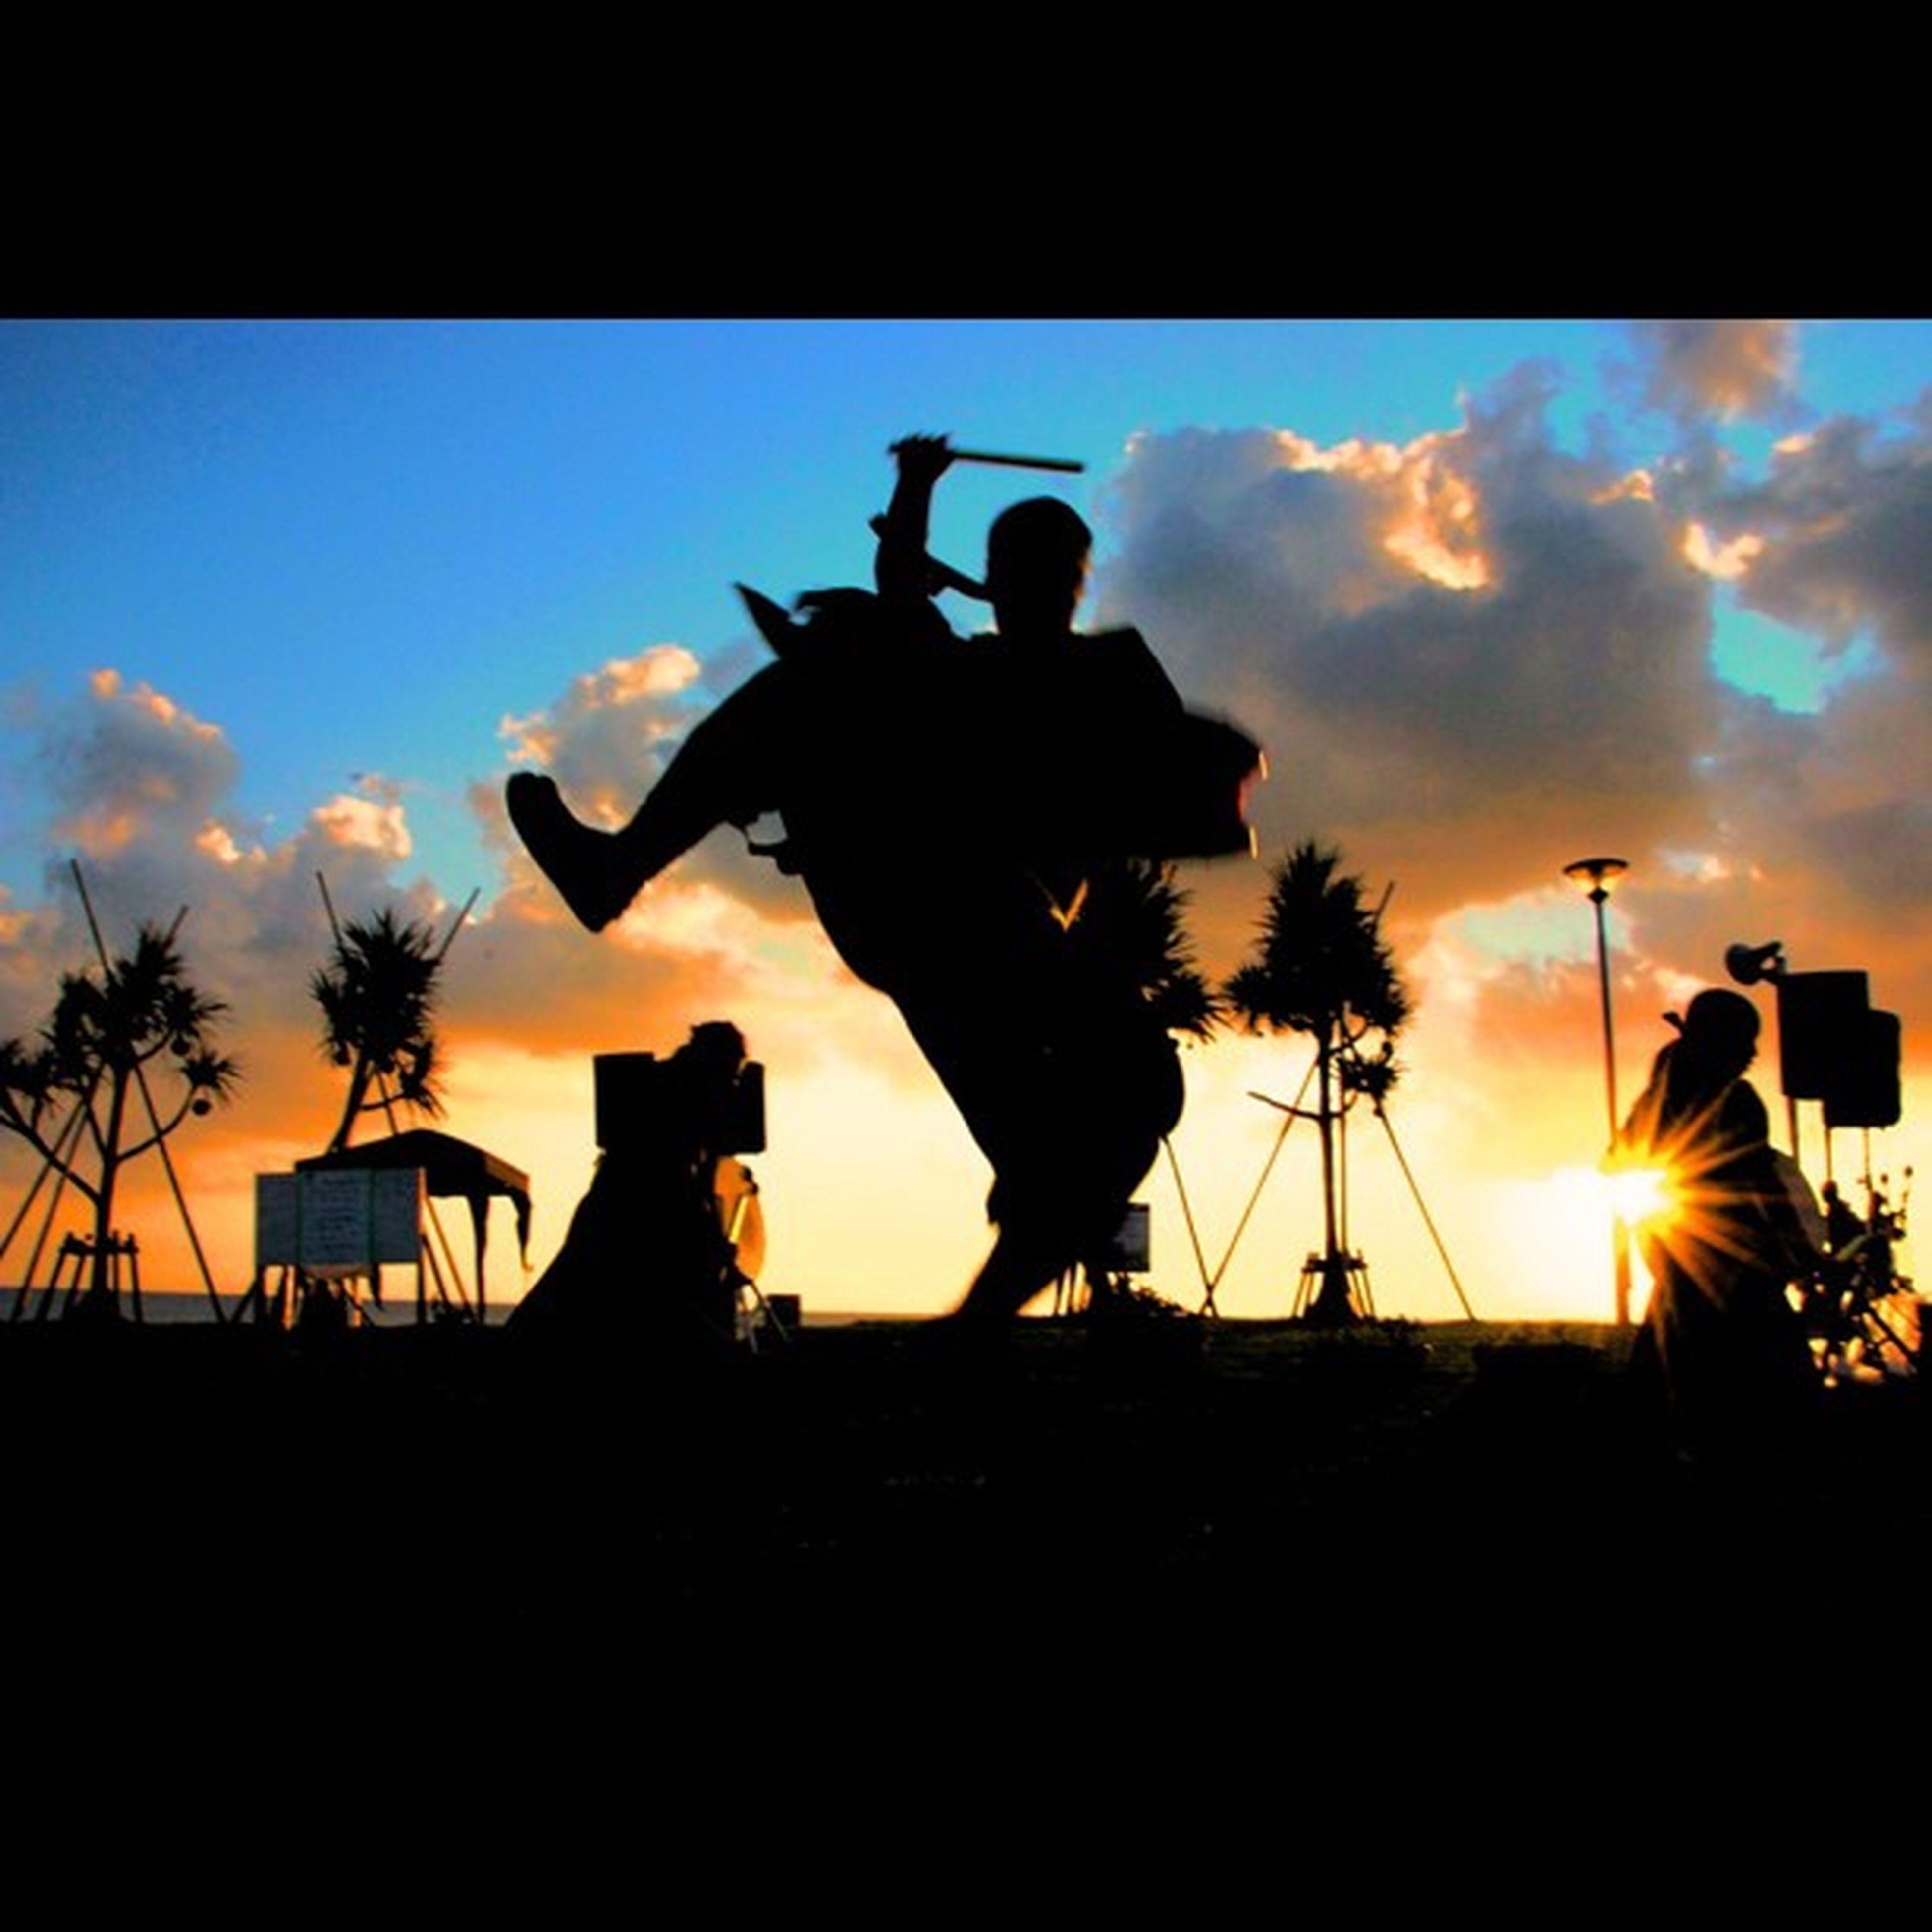 sunset, silhouette, sky, cloud - sky, sun, cloud, palm tree, sunlight, transfer print, sculpture, auto post production filter, orange color, sunbeam, nature, art and craft, horse, tree, outdoors, low angle view, men